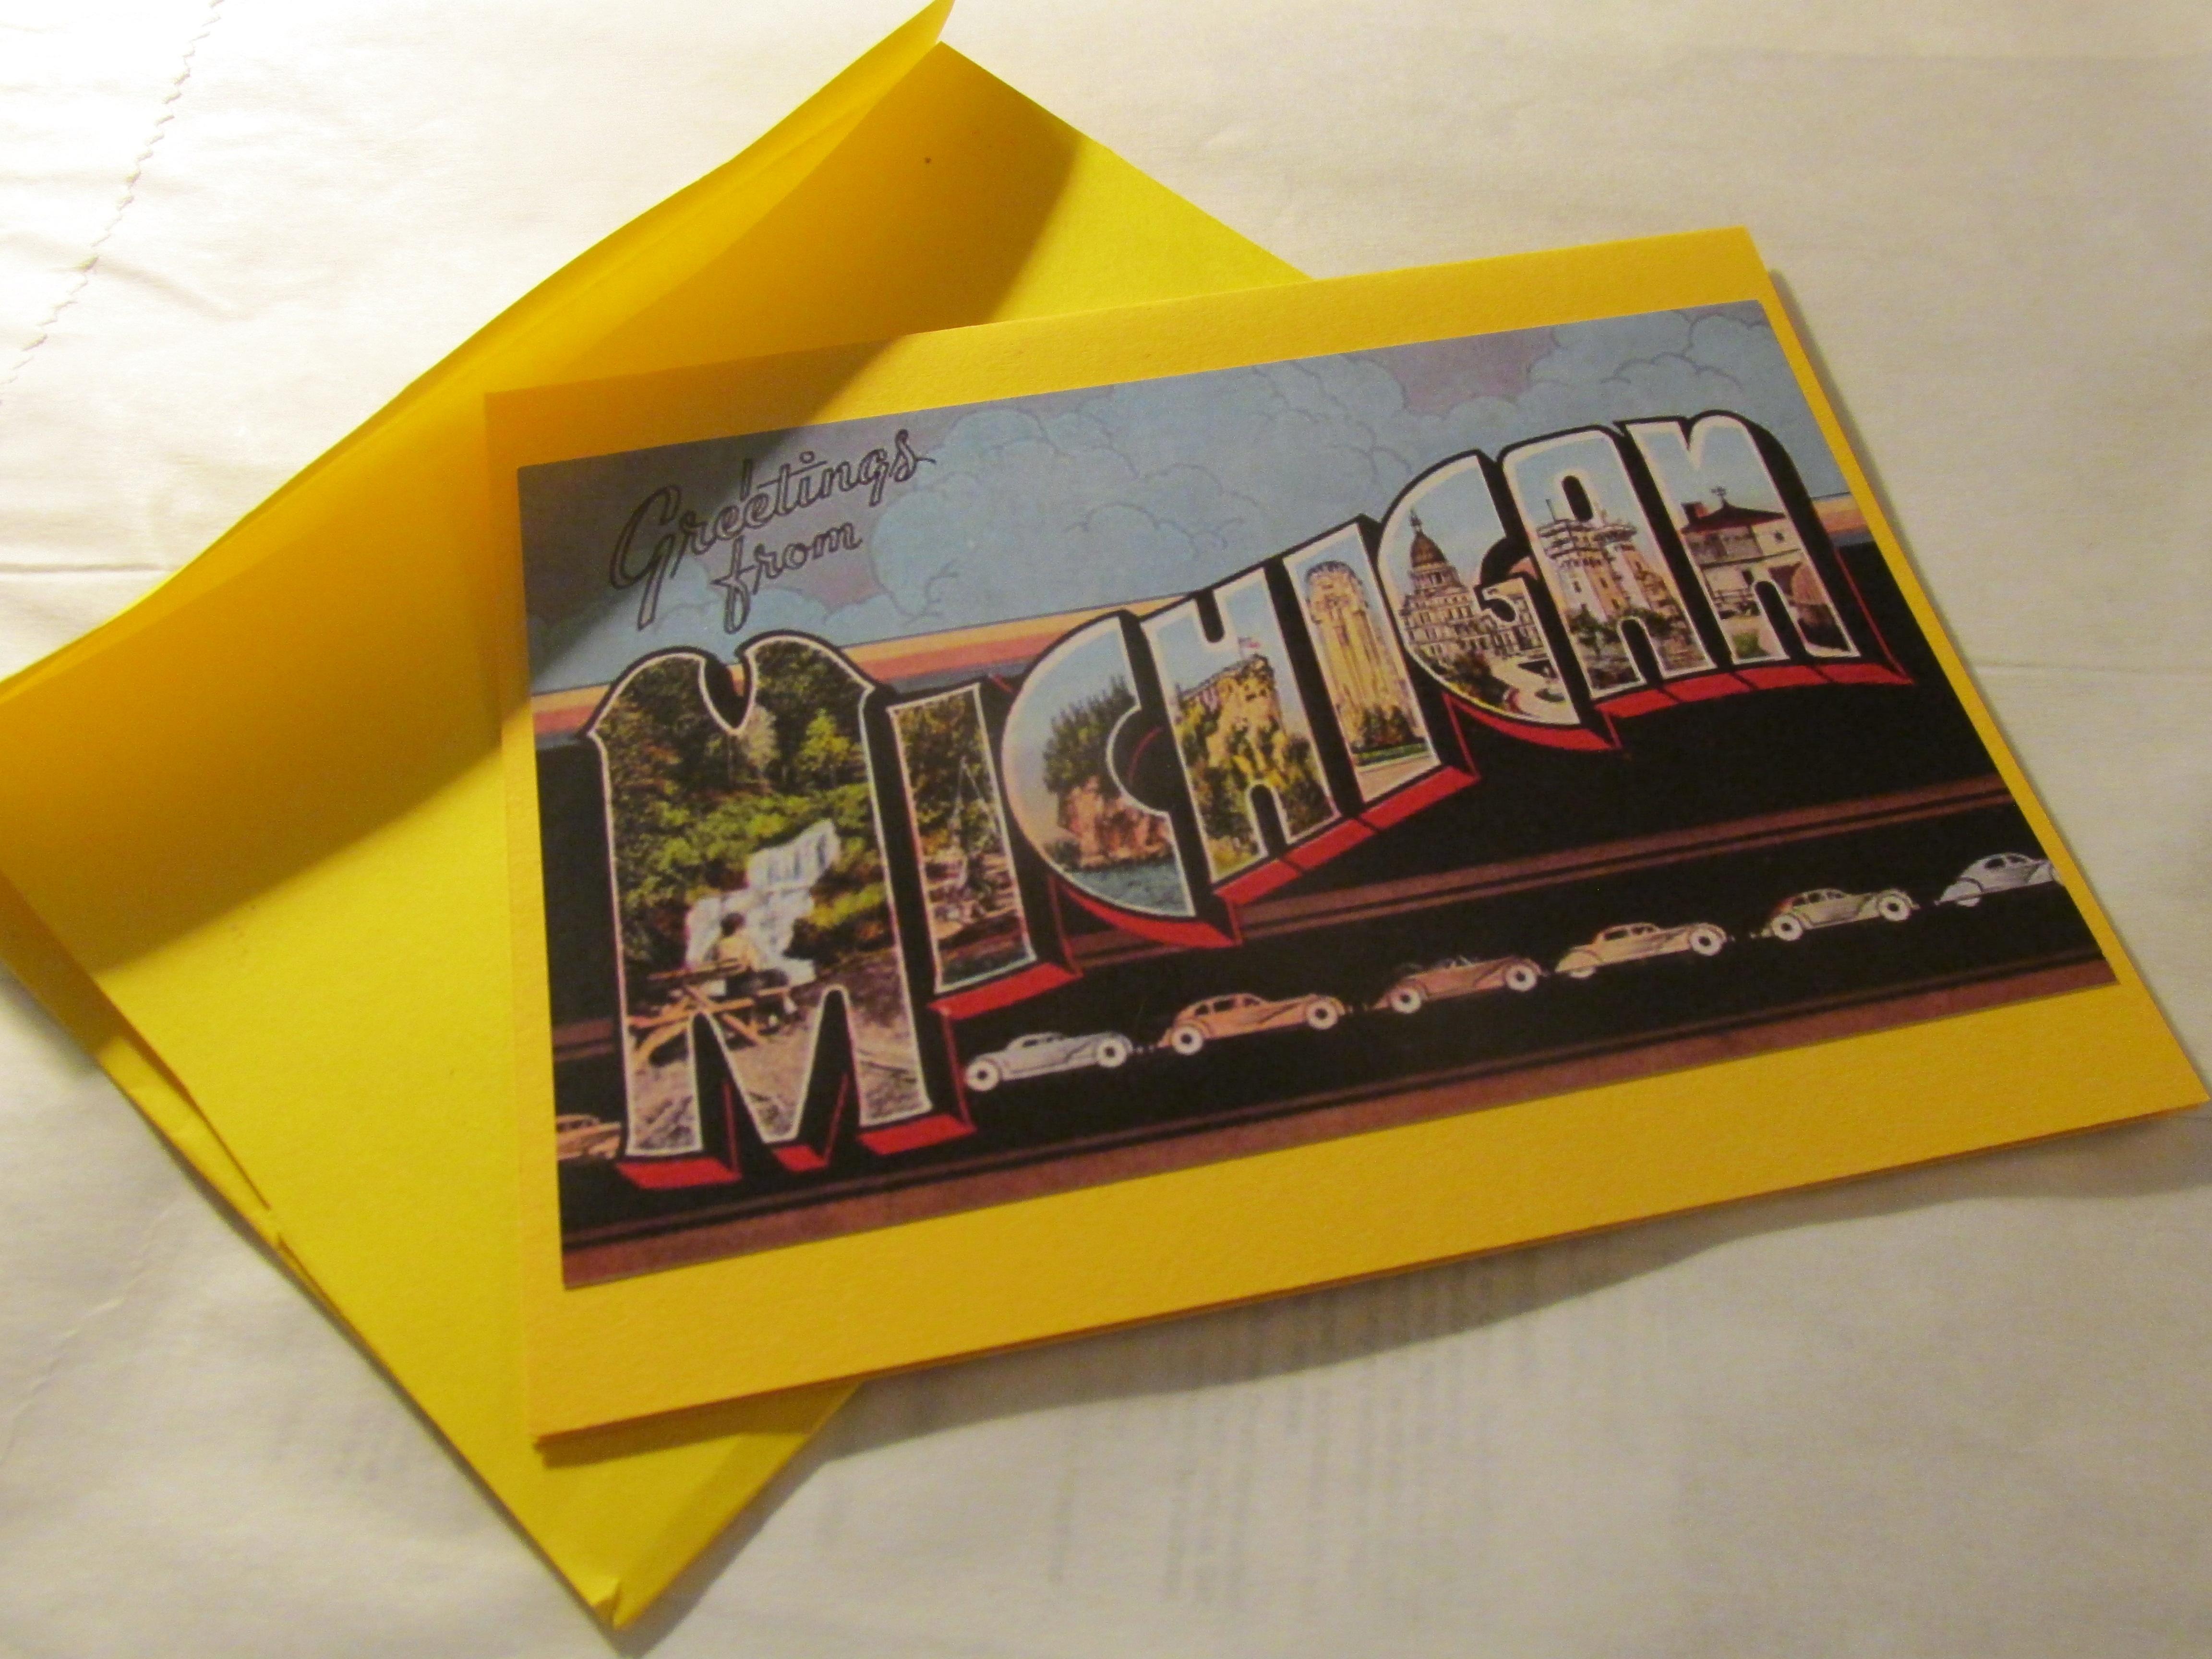 Michigan postcard greeting card cards greetings from michigan postcard greeting card cards greetings from michigan midwest craft connection m4hsunfo